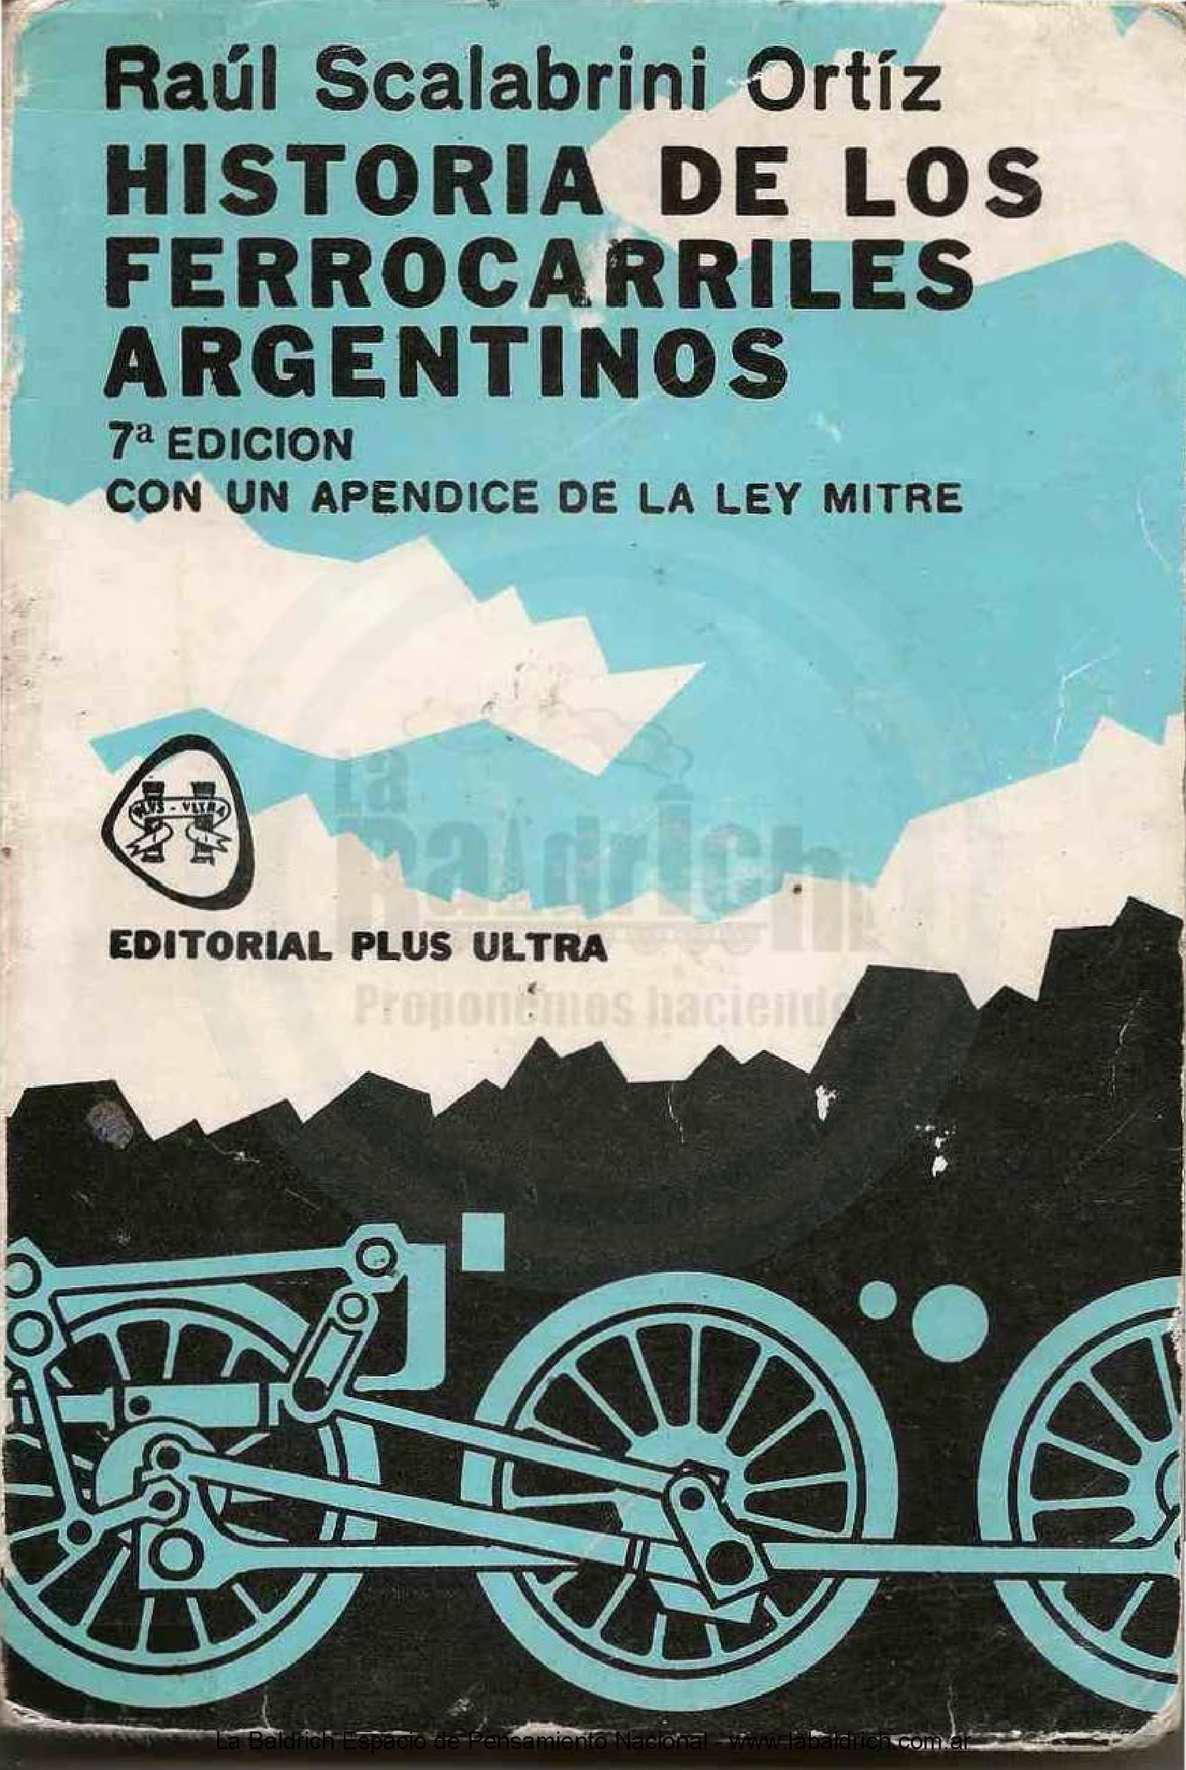 Calaméo - Raúl Scalabrini Ortiz Historia De Los Ferrocarriles Argentinos